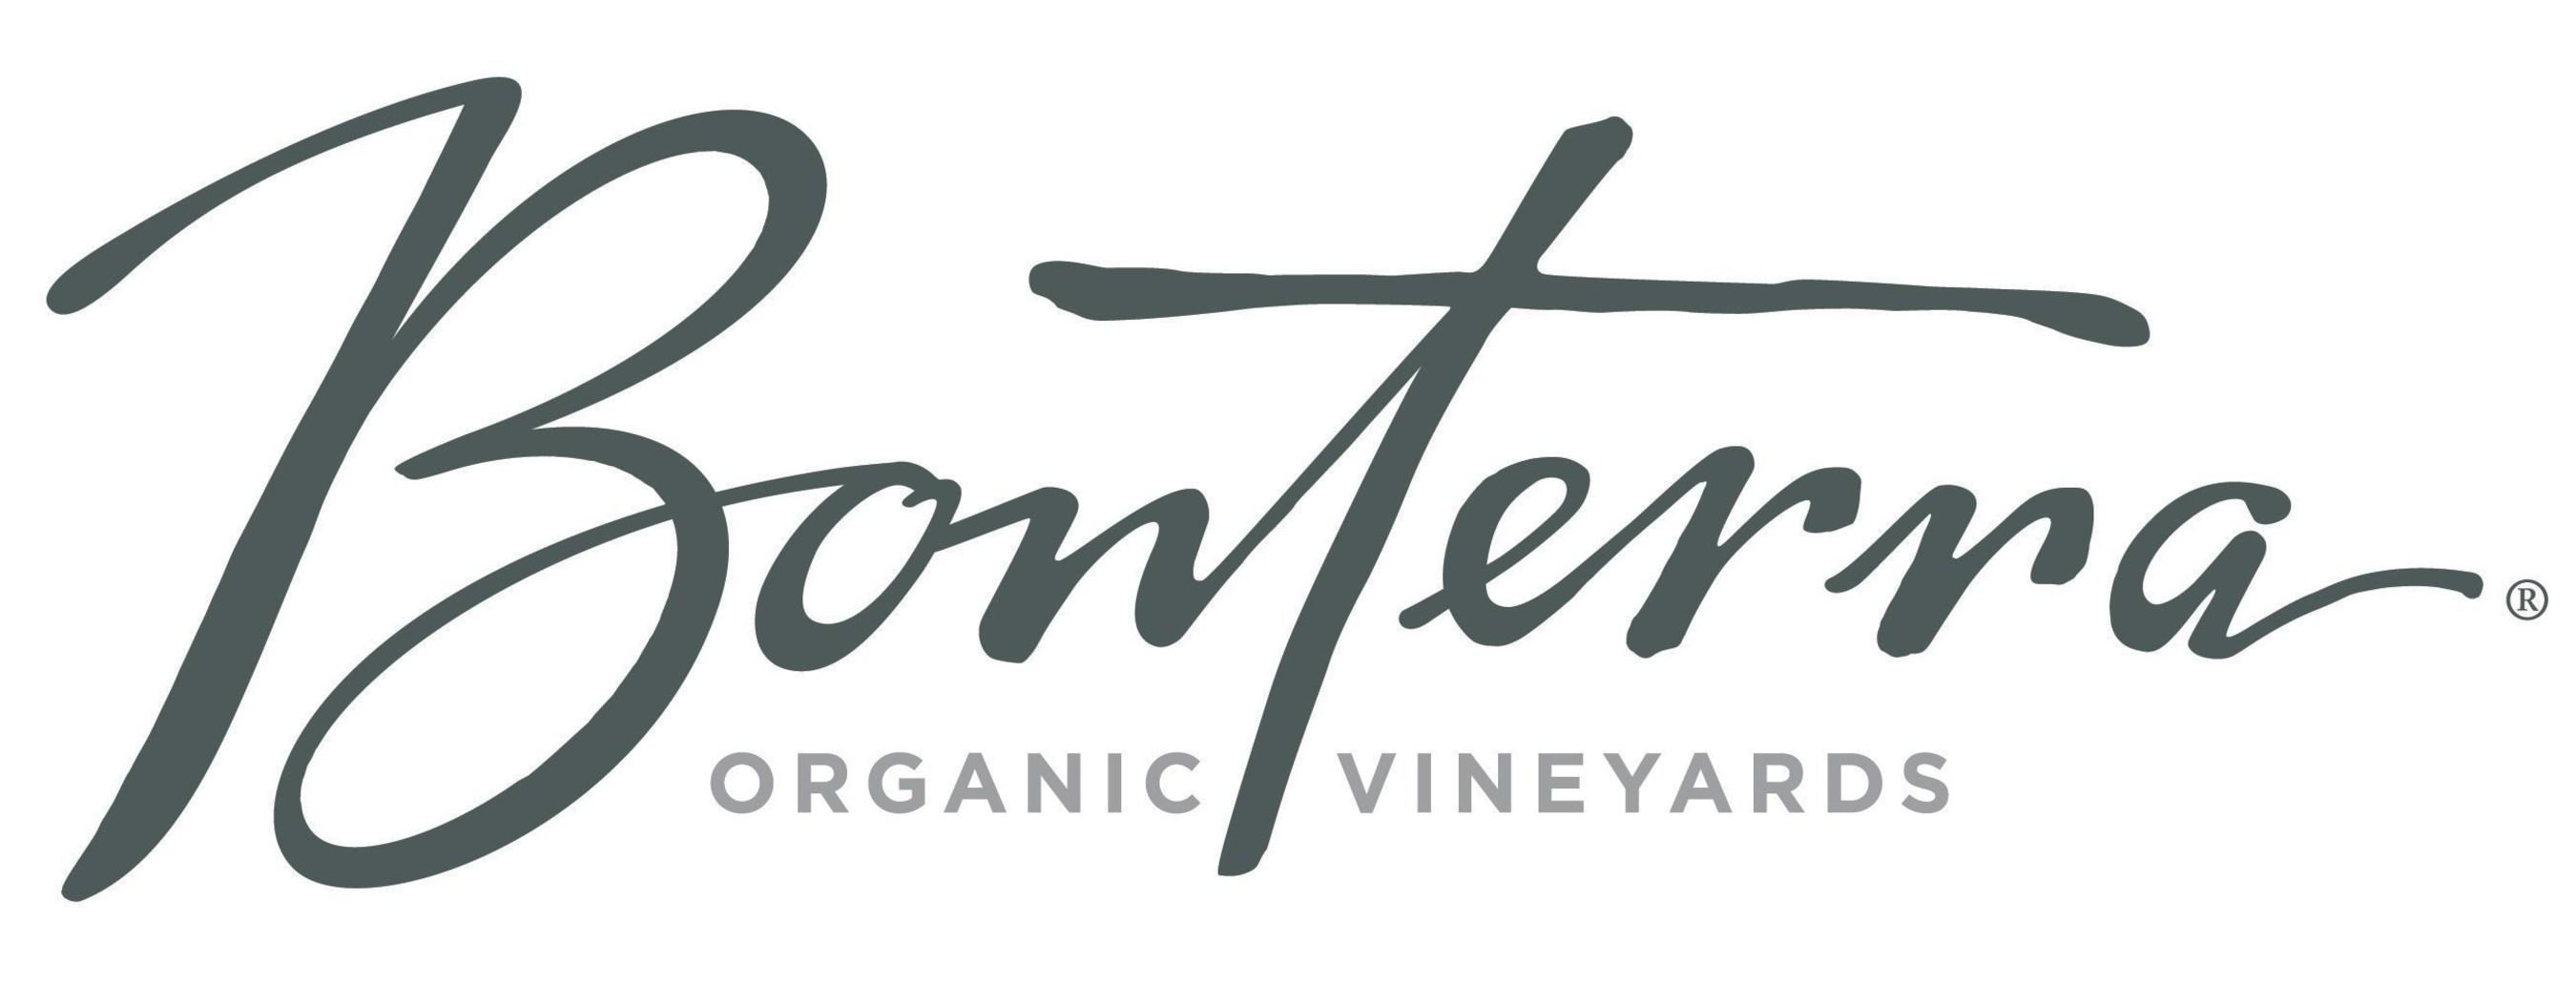 Bonterra Organic Vineyards (PRNewsFoto/Bonterra Organic Vineyards)